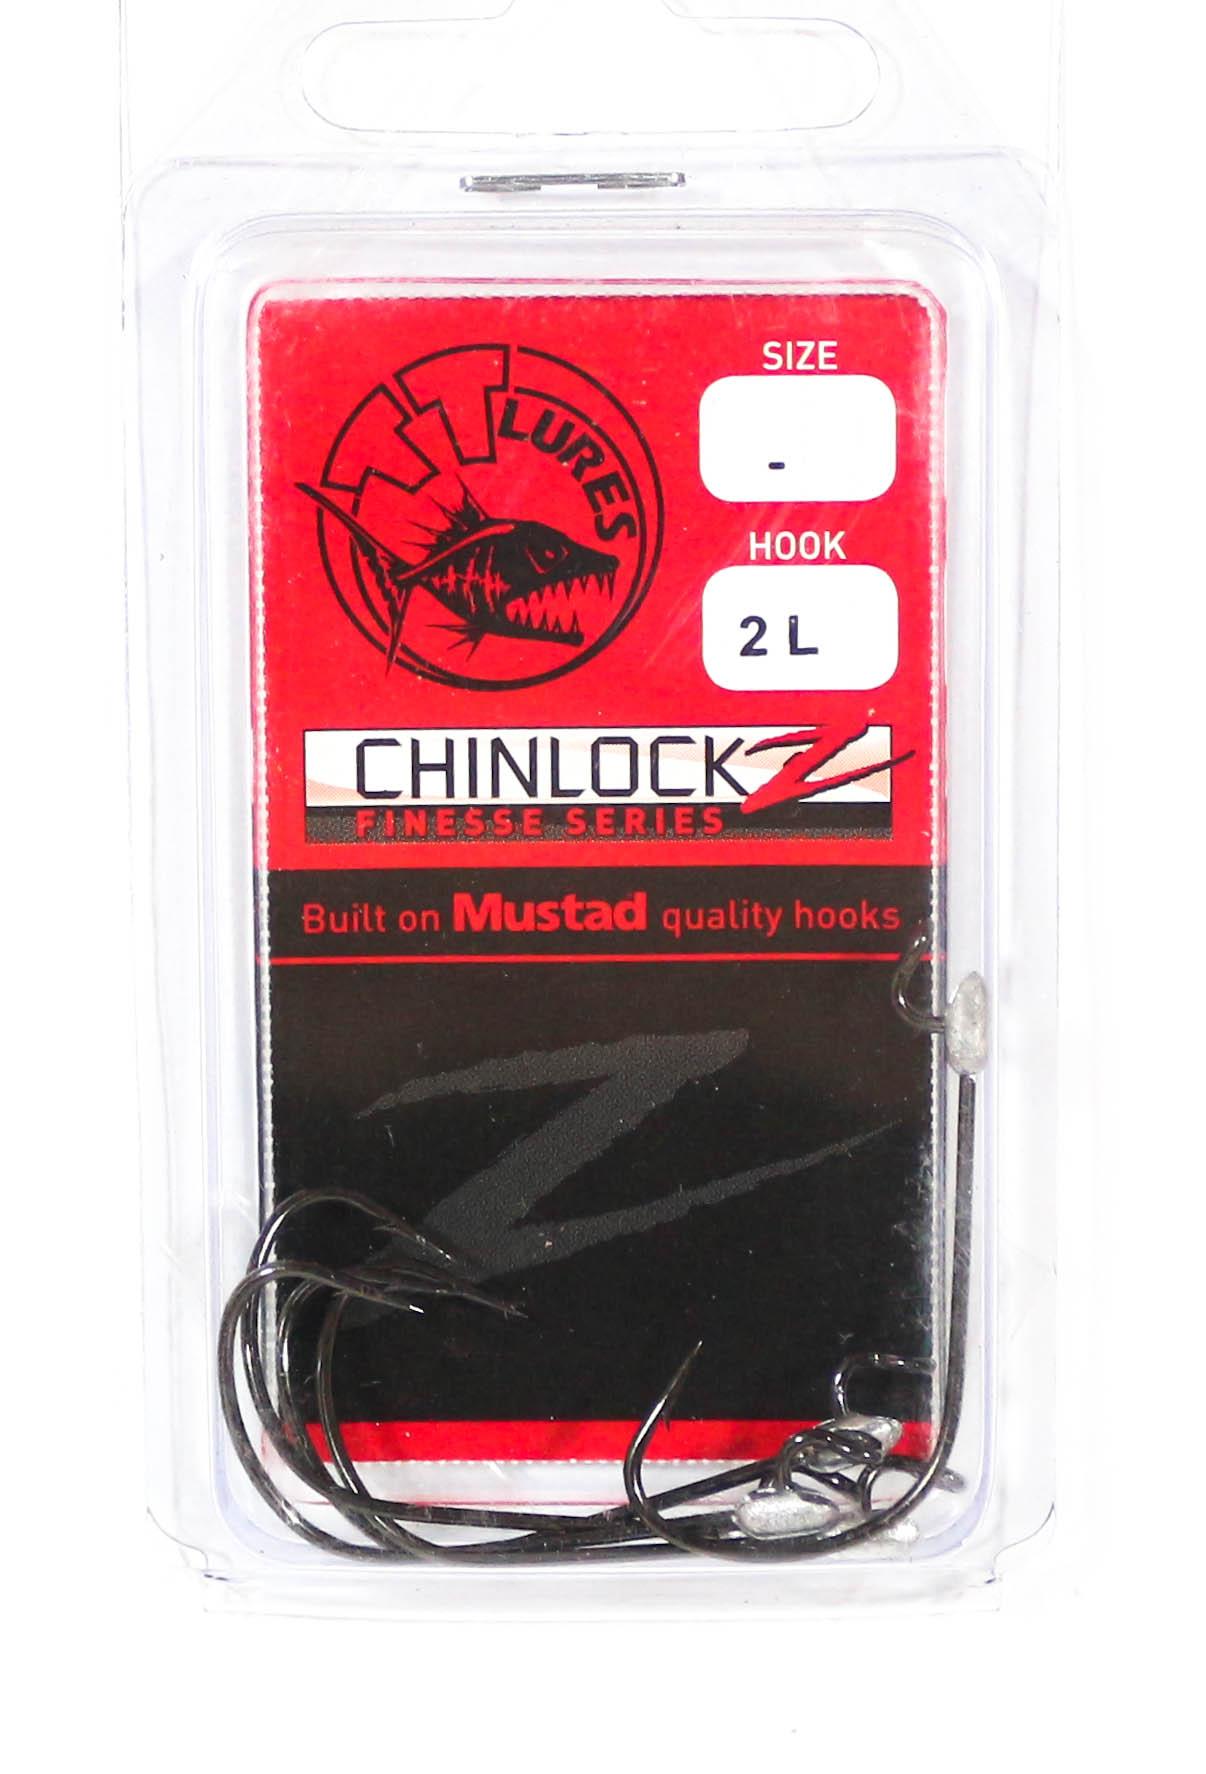 Tackle Tactics TT ChinlockZ Finesse Worm Hook 2 5 per pack (2712)